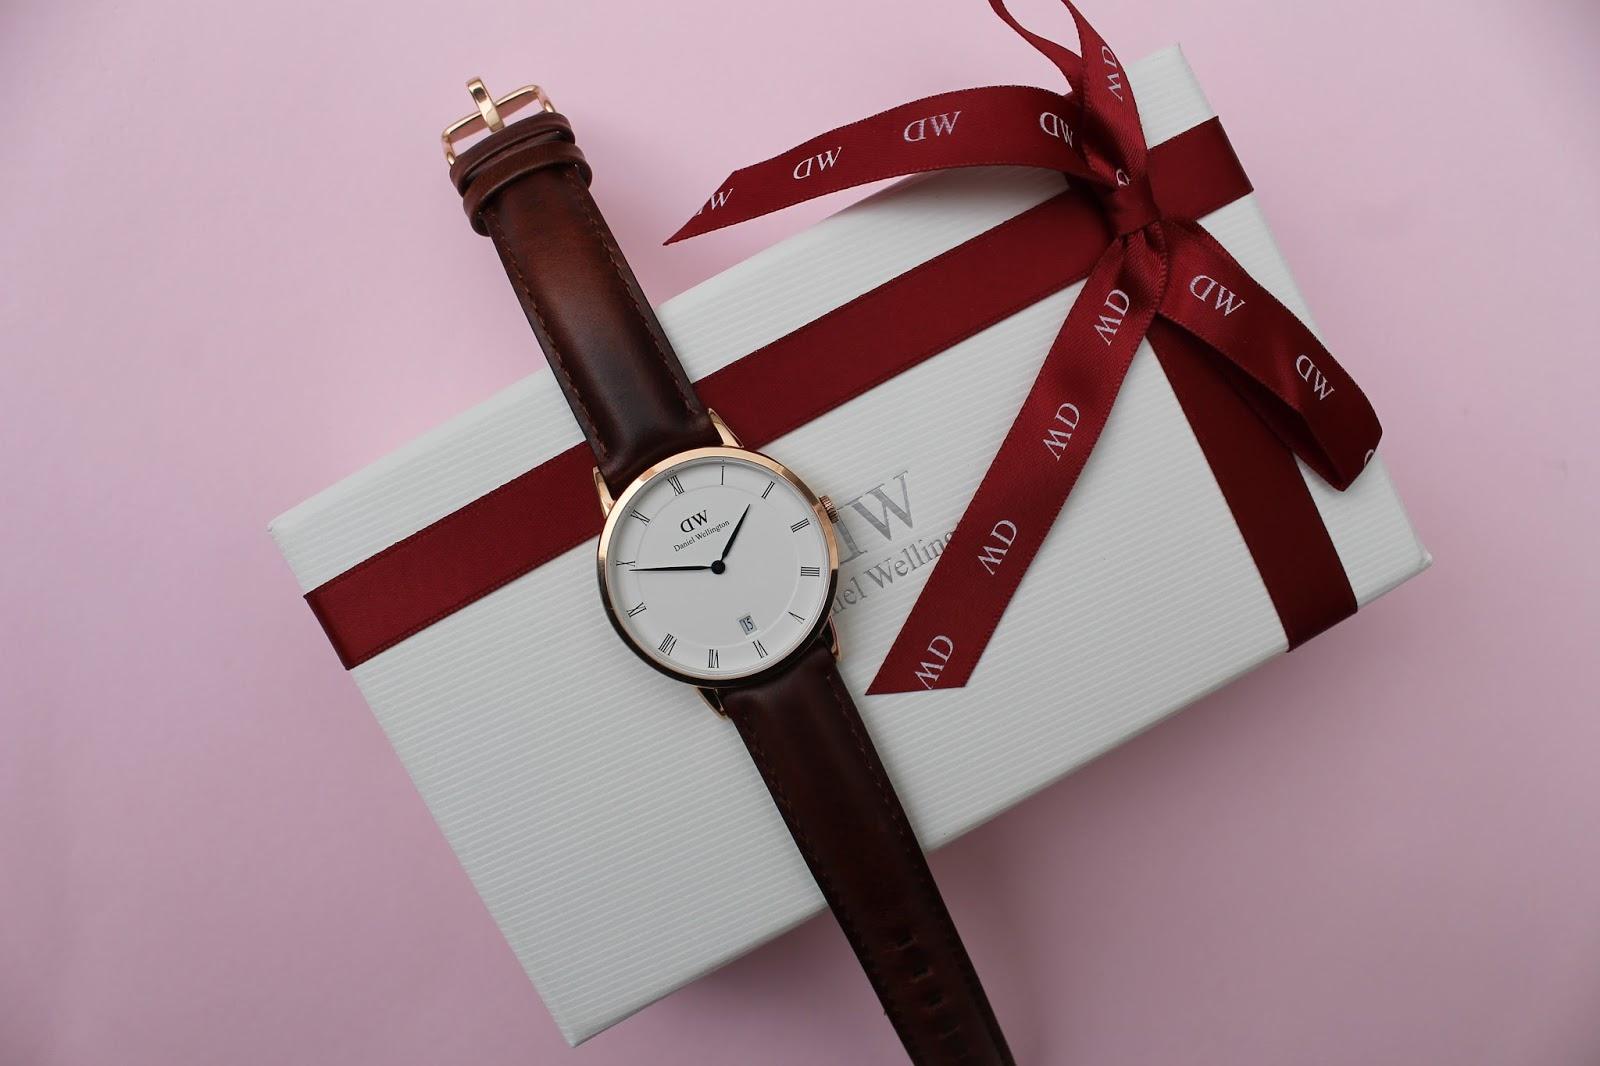 Reloj daniel wellington mujer dorado